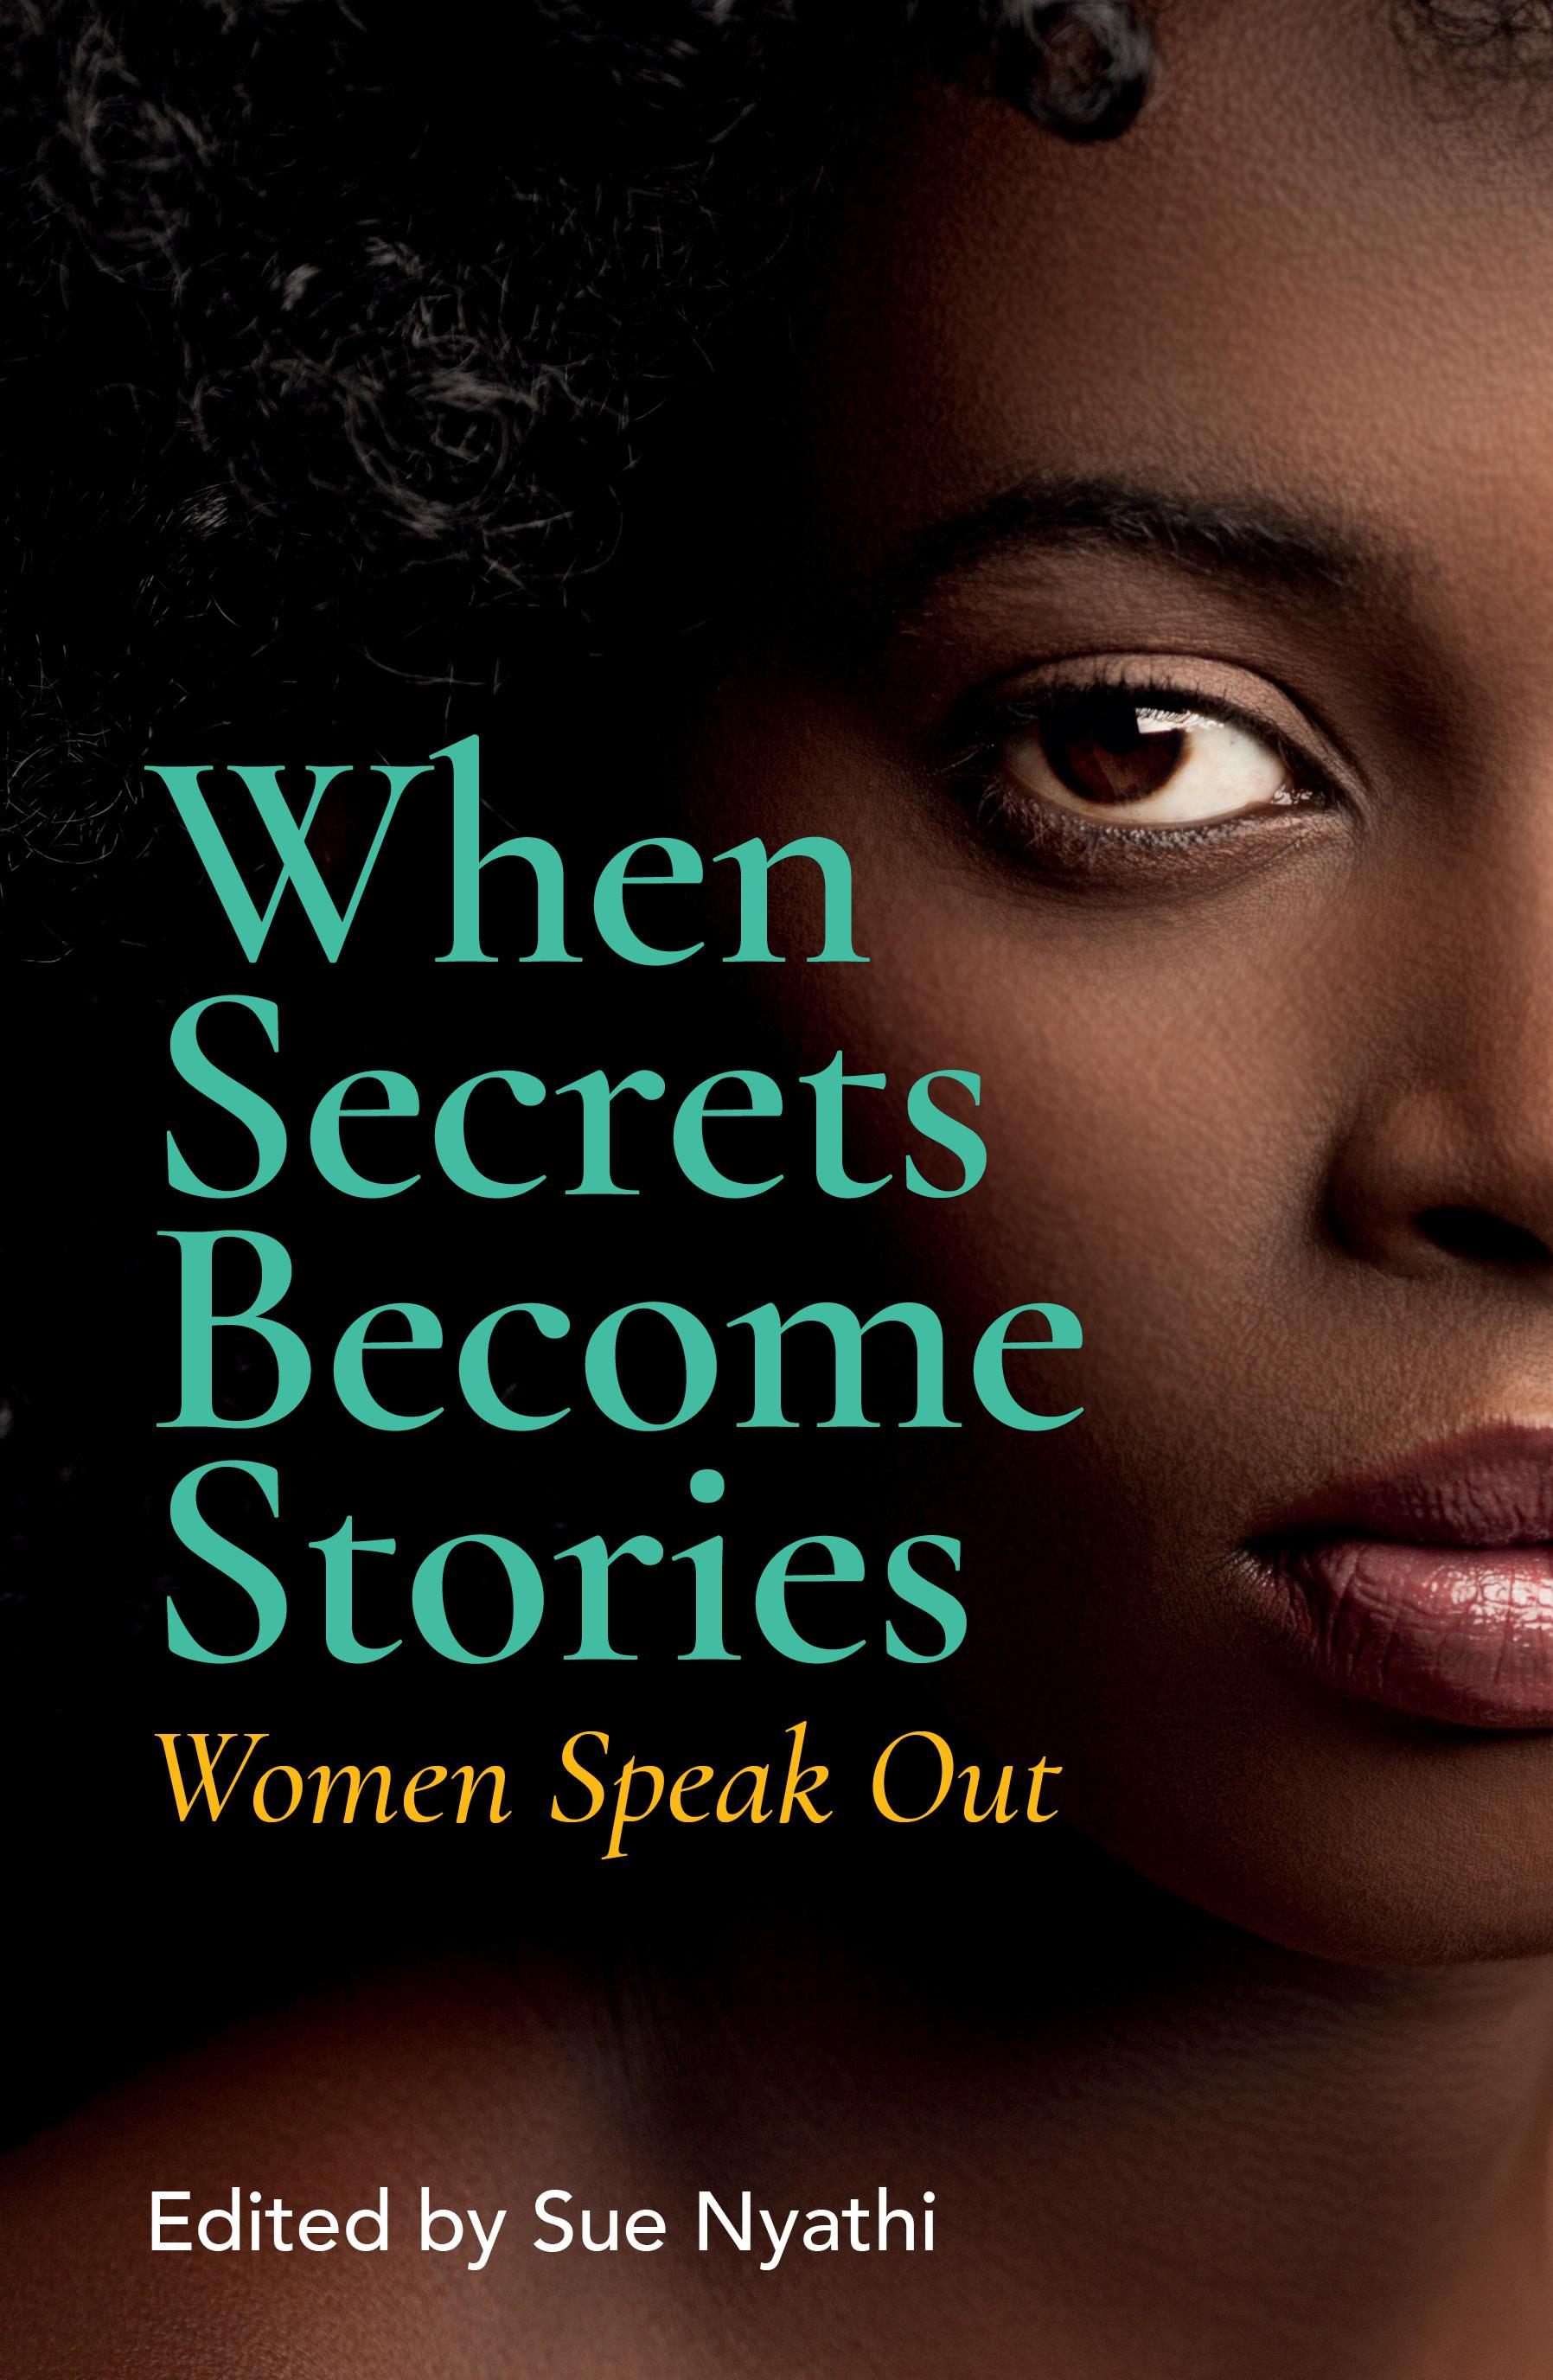 When Secrets Become Stories : Women Speak Out